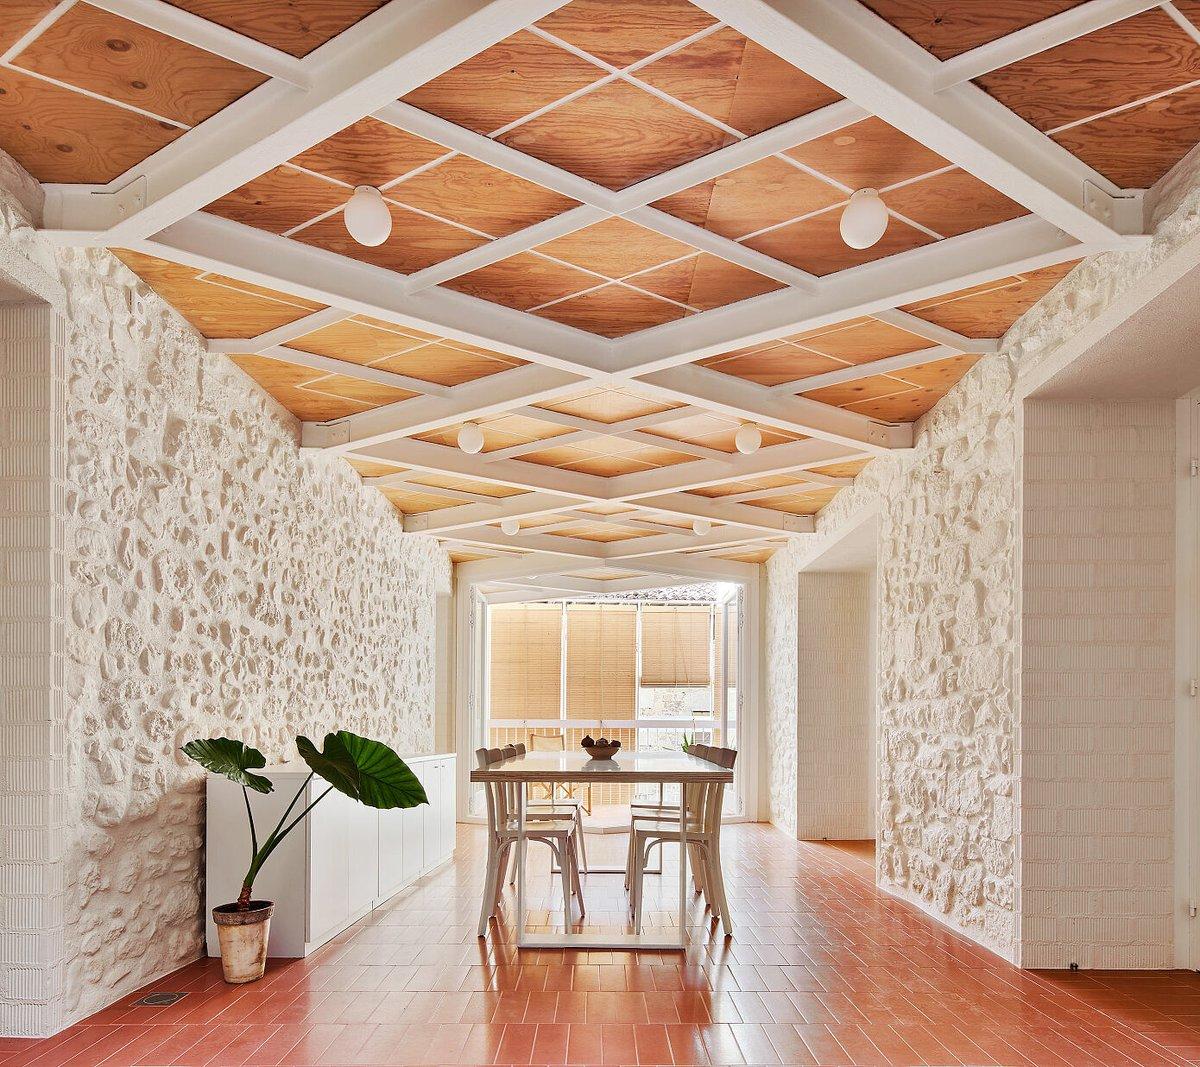 Terraces by Unparelld'aquitectes  https://t.co/rmHQ32e3cu  #architecture #decor #interiordesign #home https://t.co/IMpnBpowHW